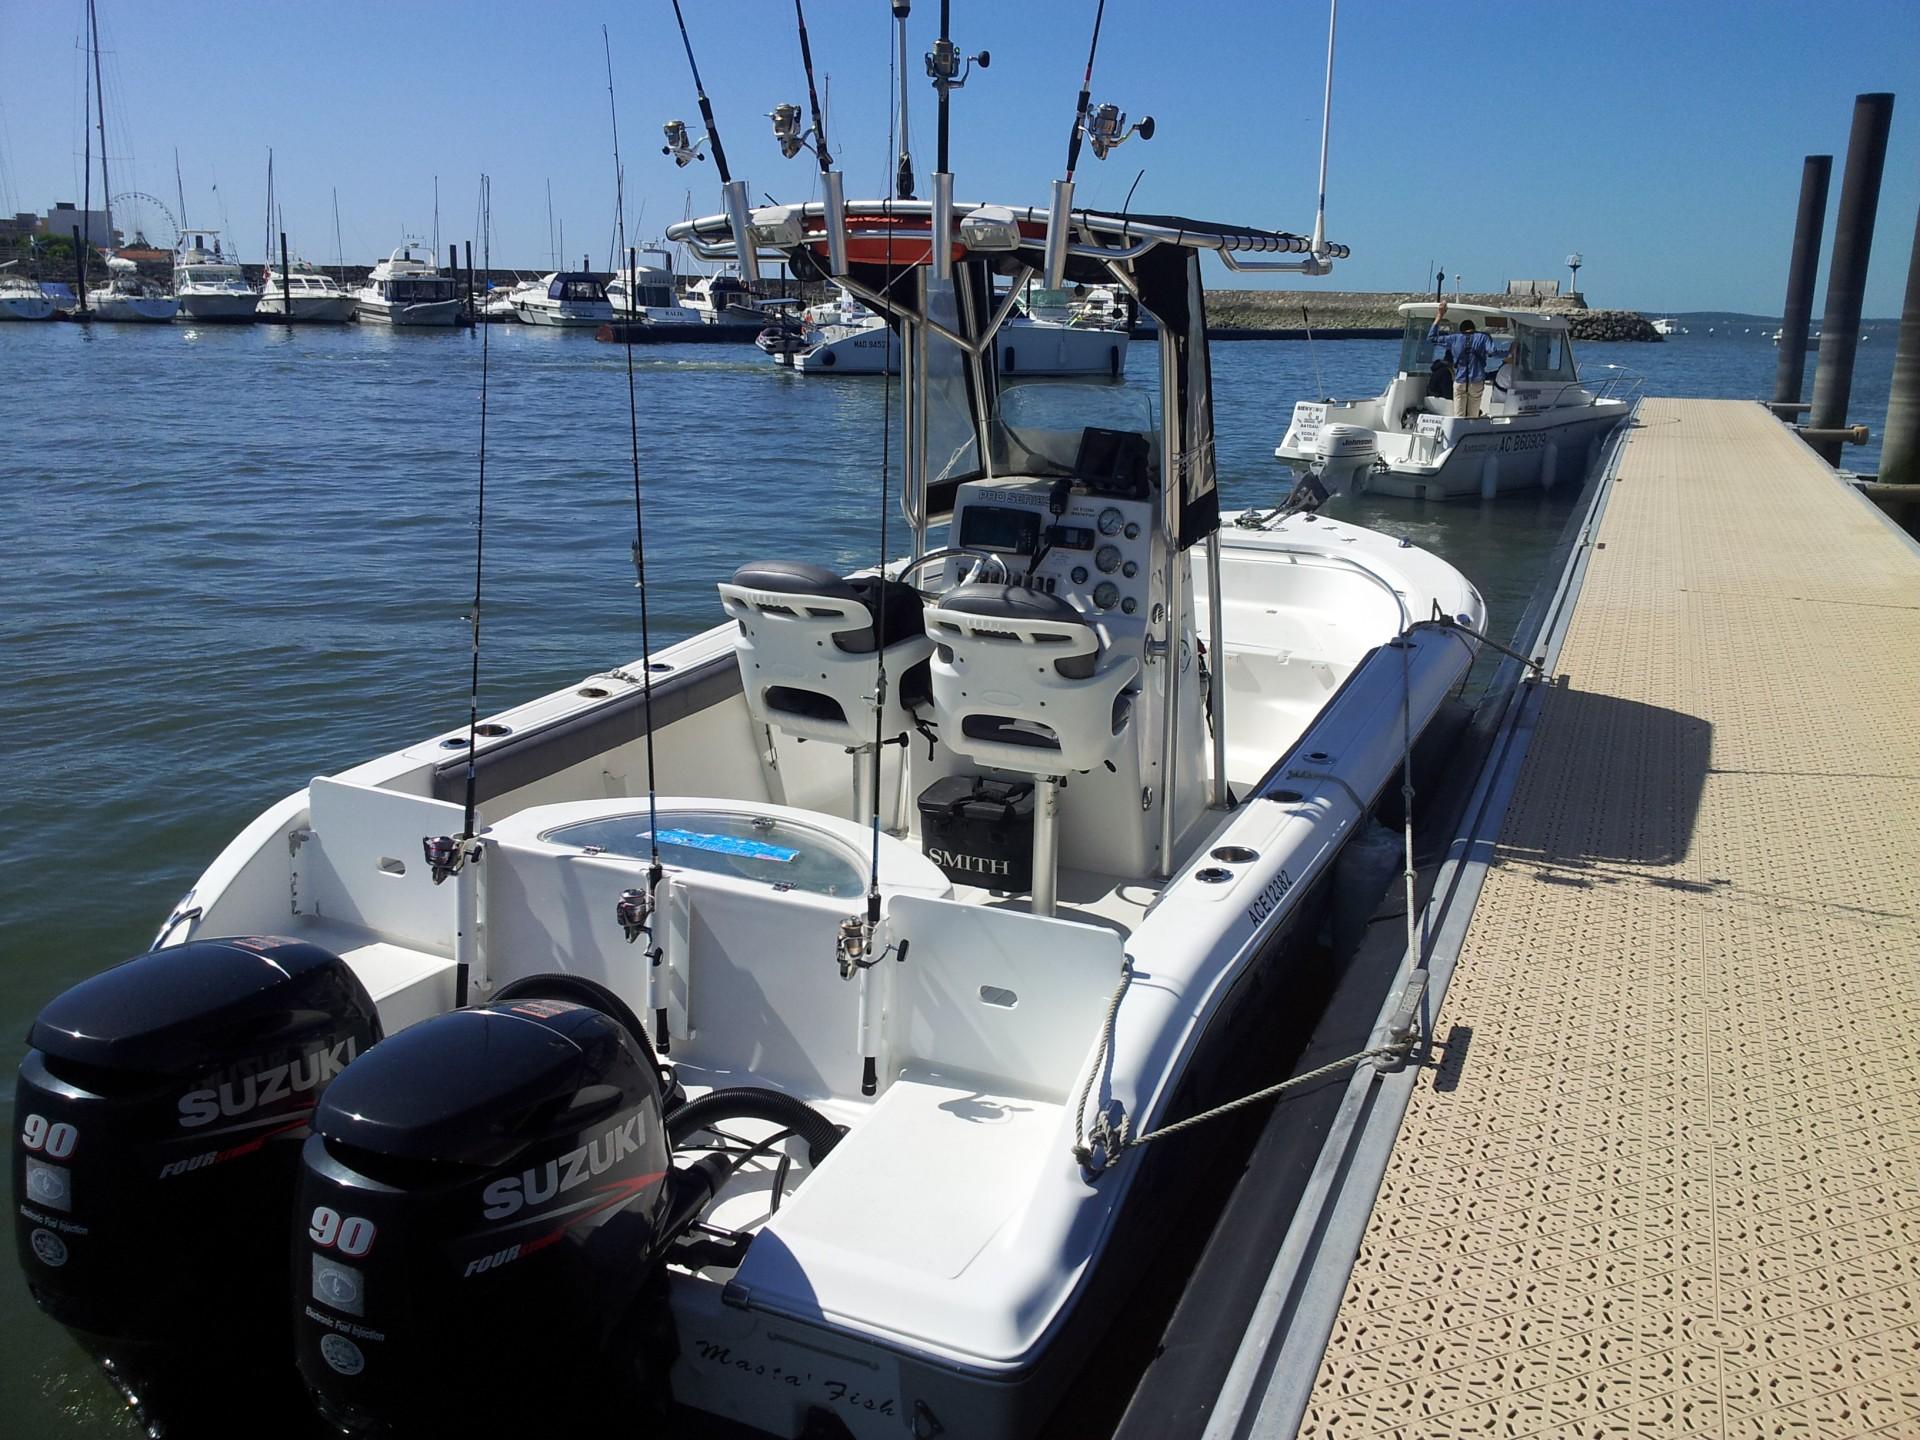 bateau de peche arcachon le mastafish jeremy dupin